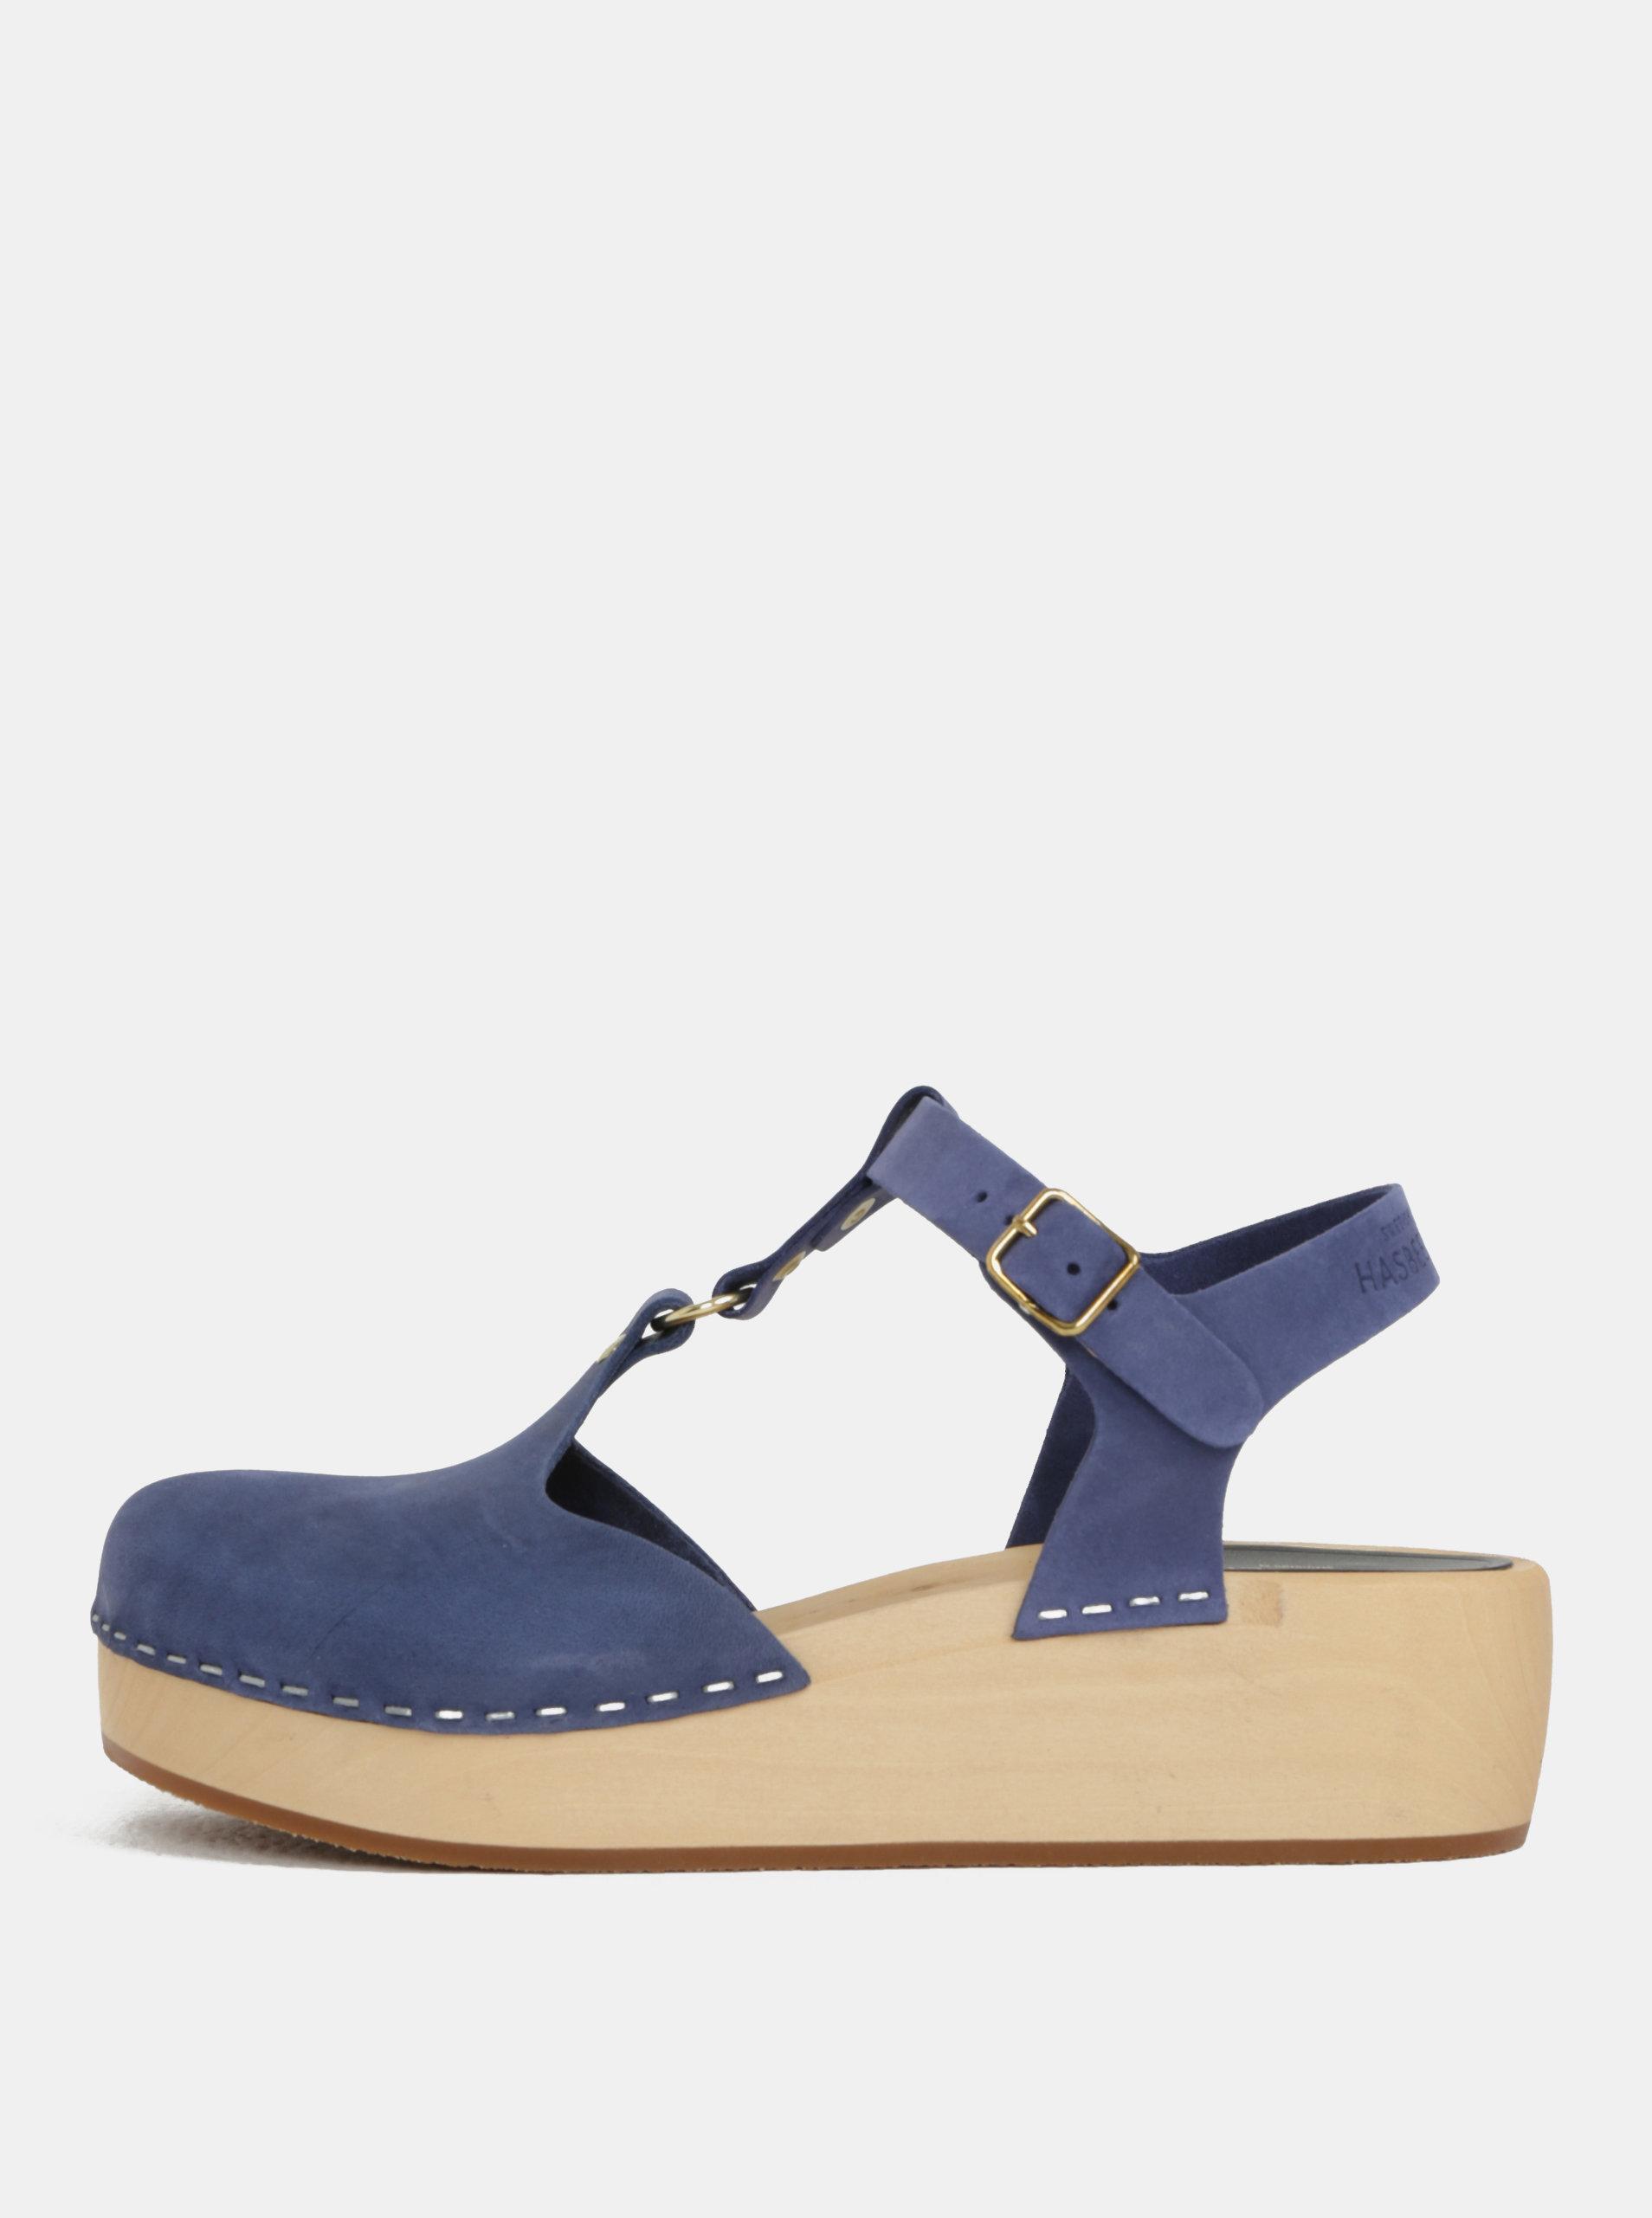 8b832a0ef7c6f Dreváky na platforme s modrými koženými remienkami Swedish Hasbeens Ring  Sandal ...